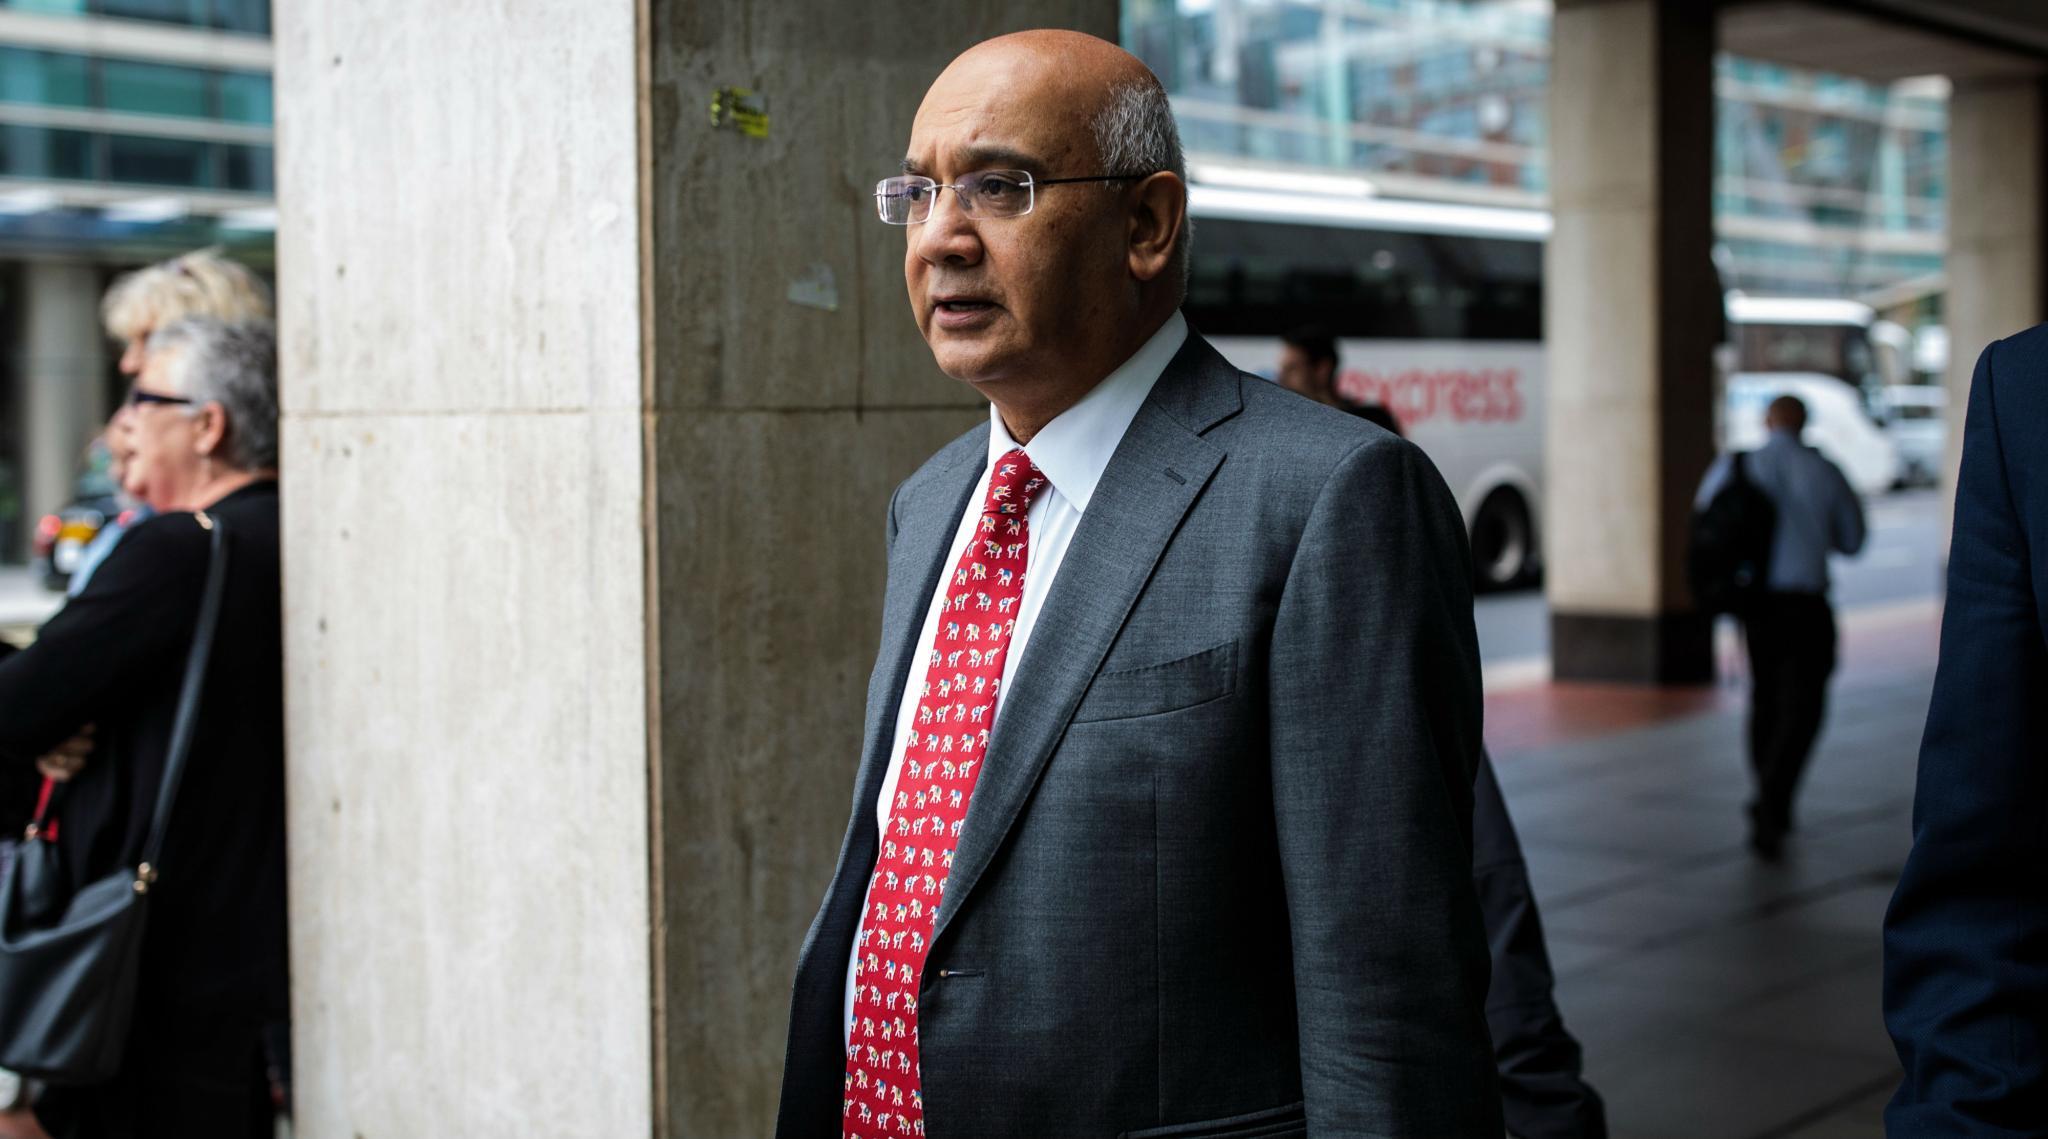 Britain's Longest-Serving Indian-Origin MP Keith Vaz Announces Retirement From UK Parliament